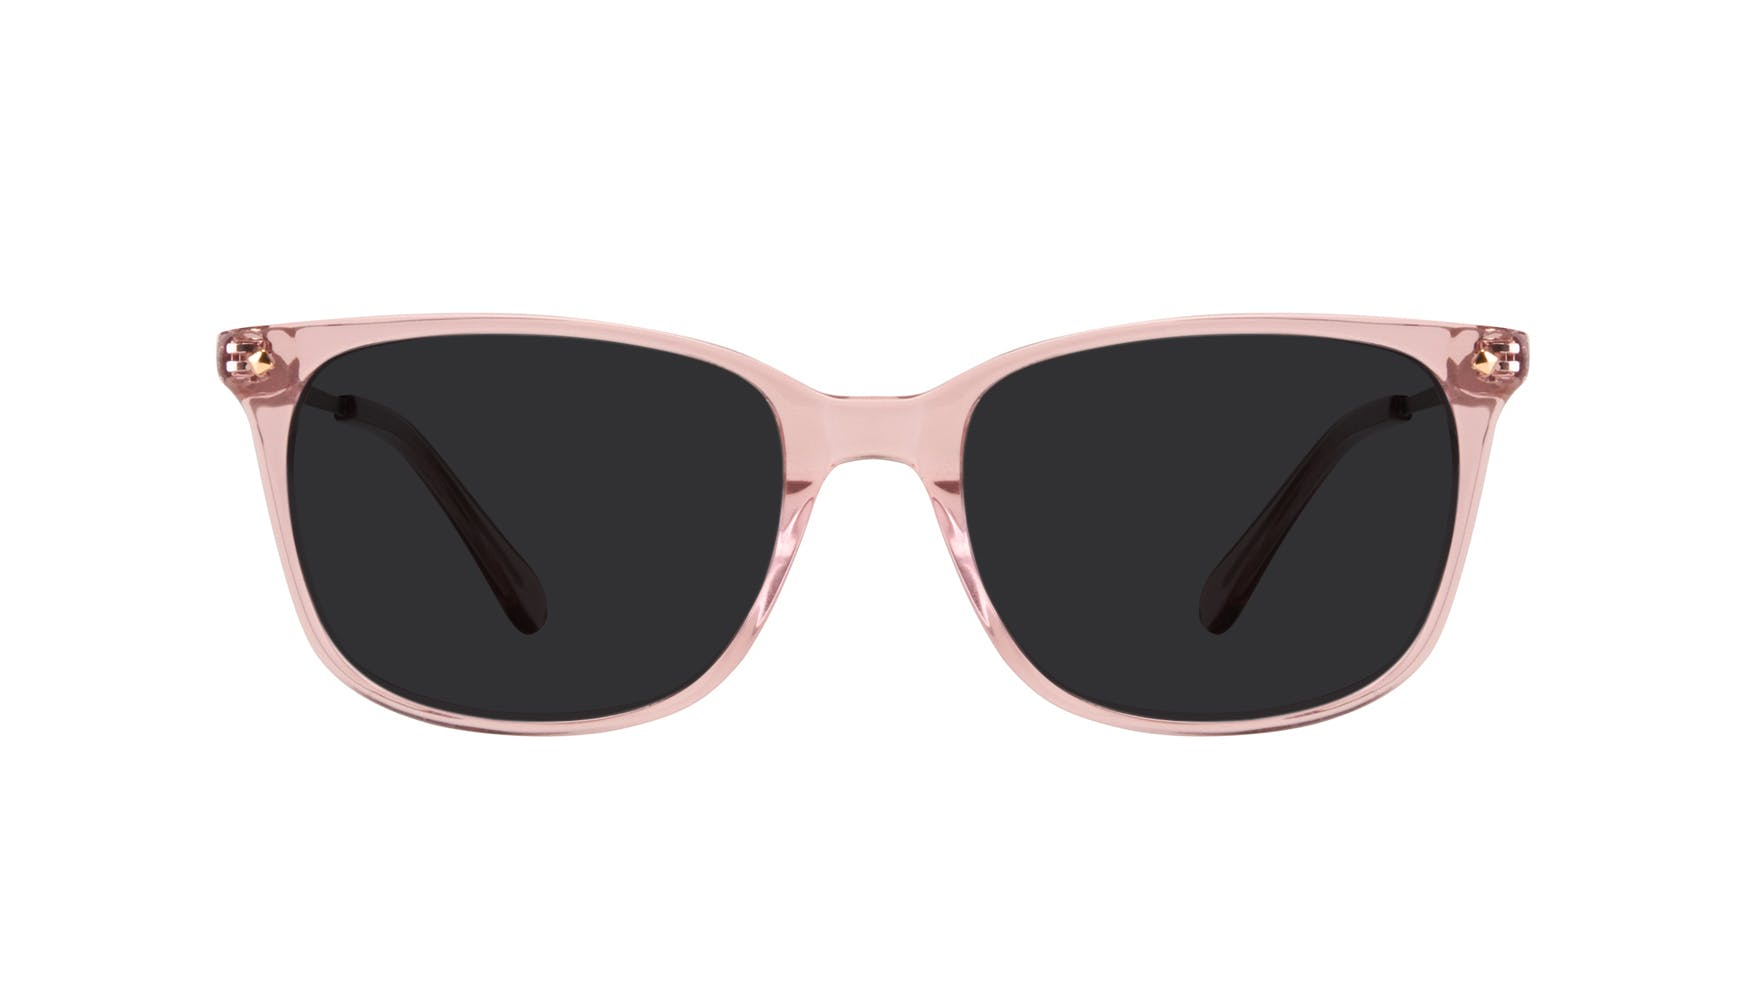 Affordable Fashion Glasses Rectangle Square Sunglasses Women Refine Rose Front